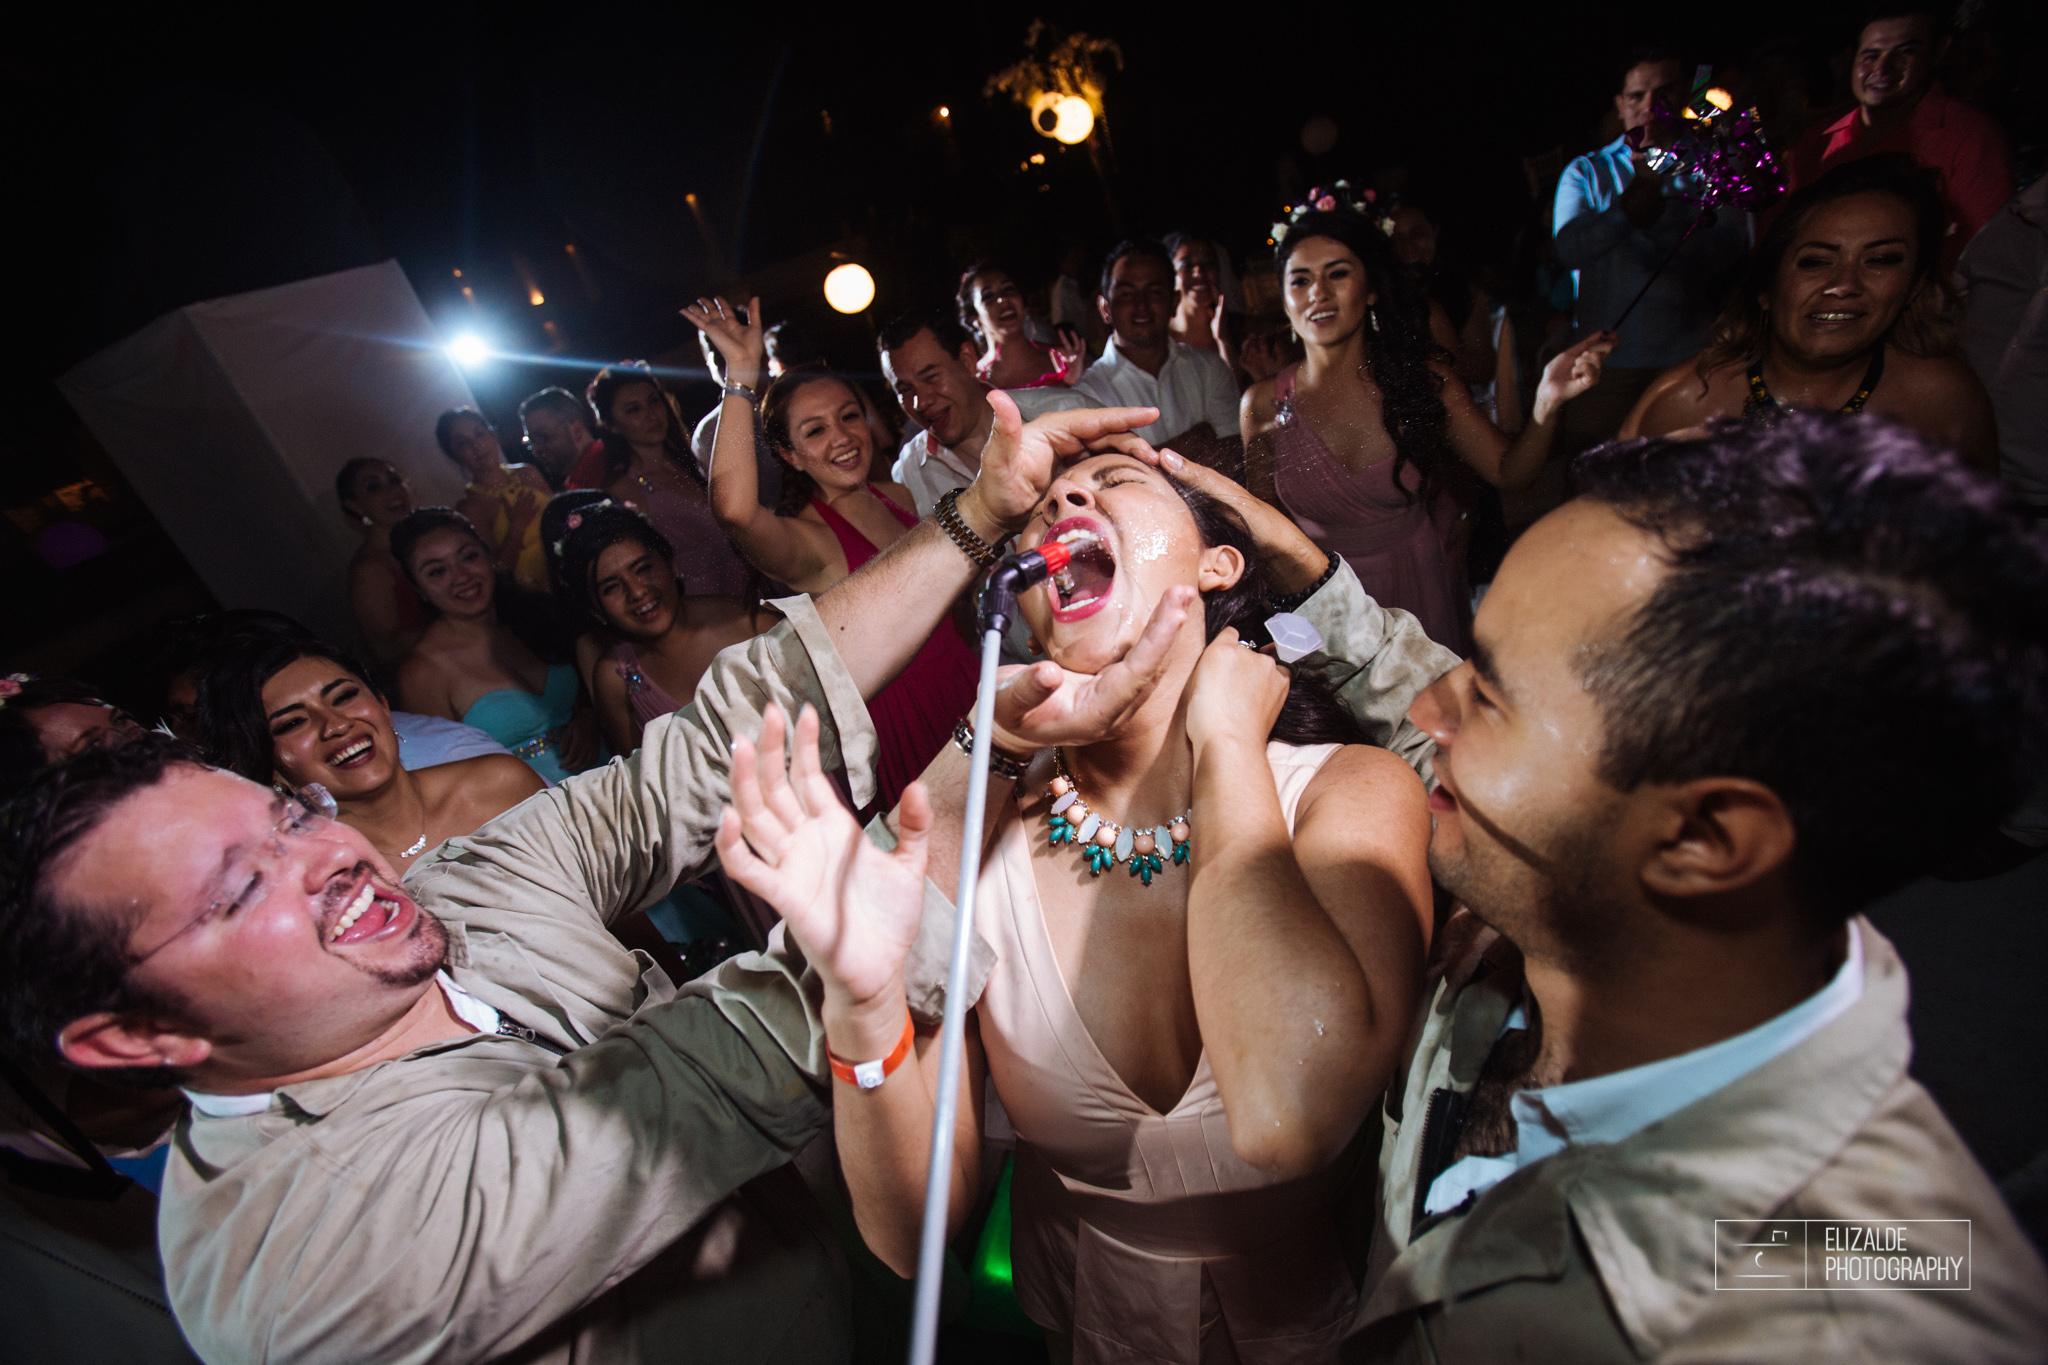 Pay and Ferran_Acapulco_Destination Wedding_Elizalde Photography-140.jpg